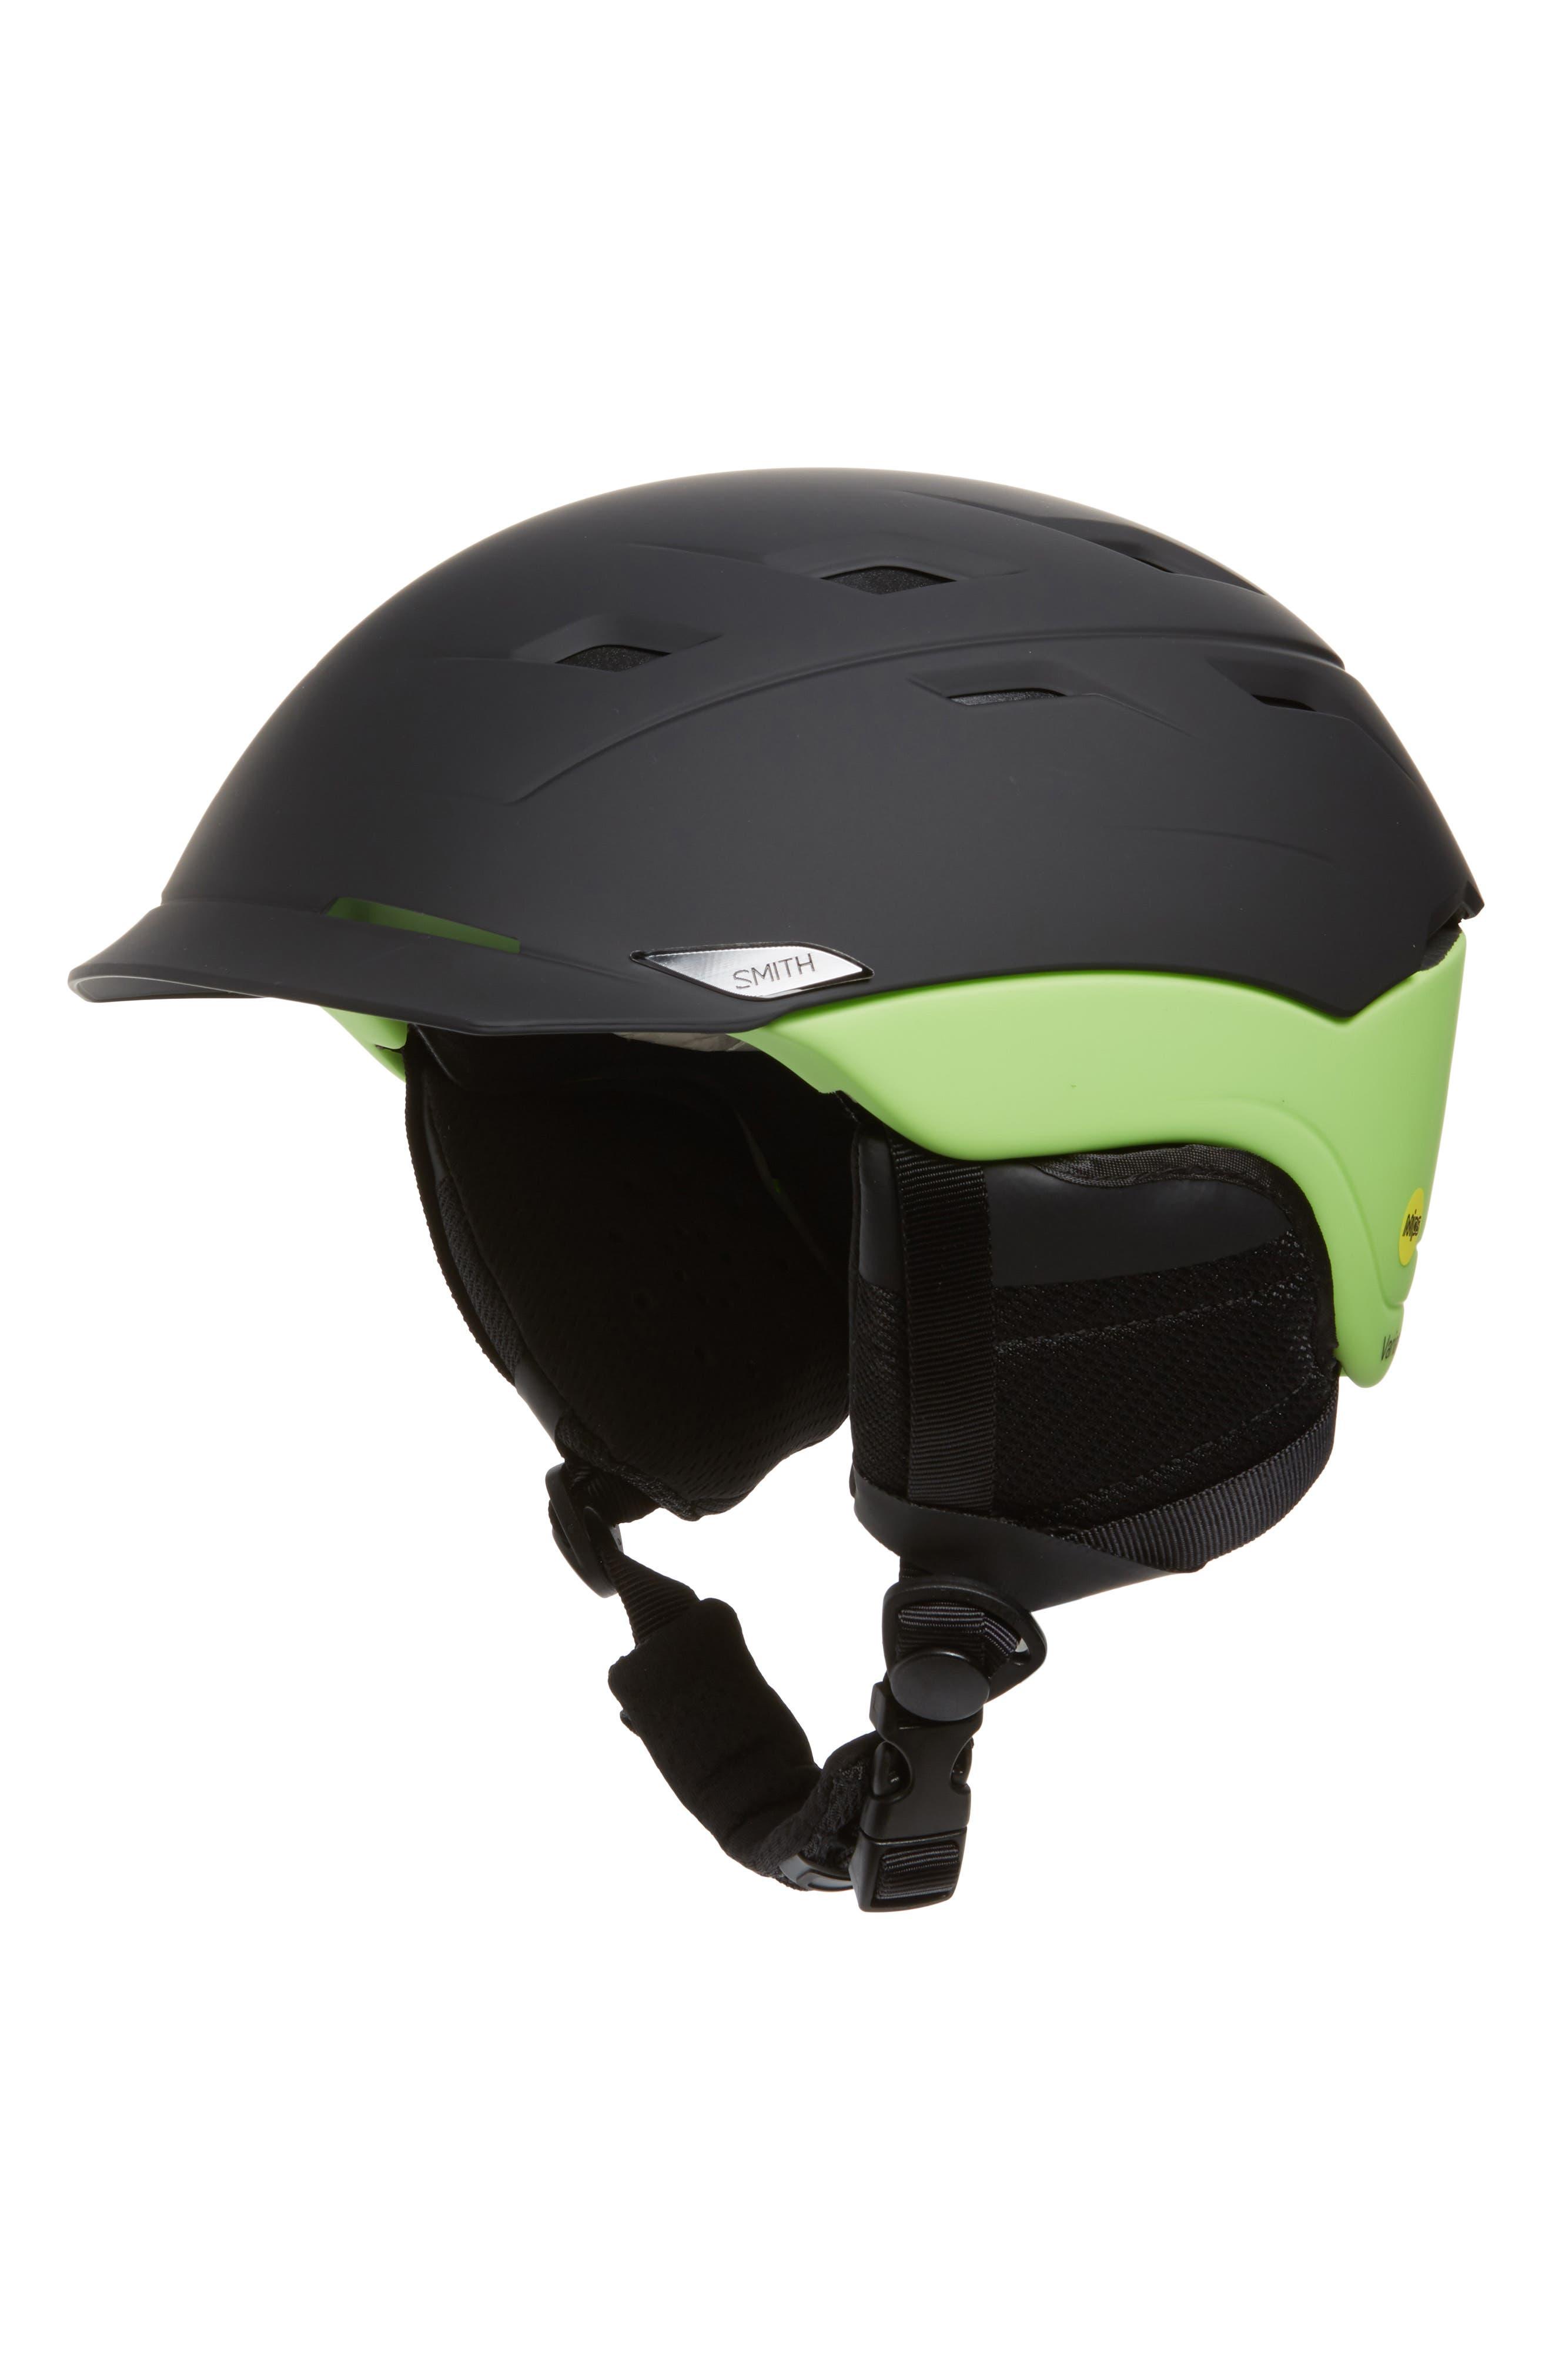 Variance MIPS Snow Helmet,                         Main,                         color, MATTE BLACK / FLASH